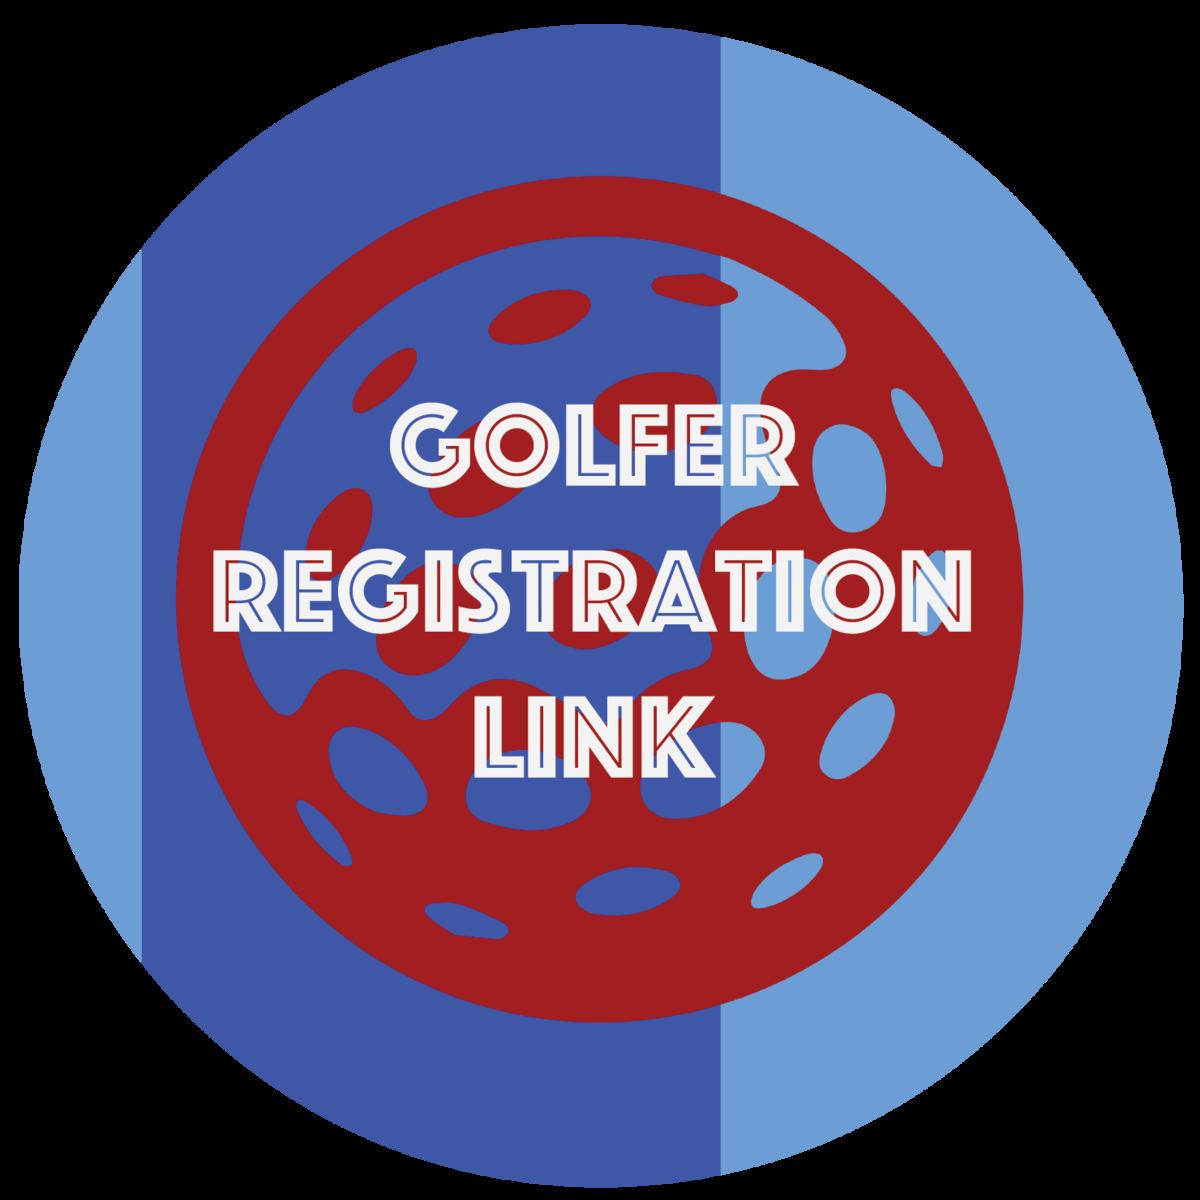 Golfer Registration